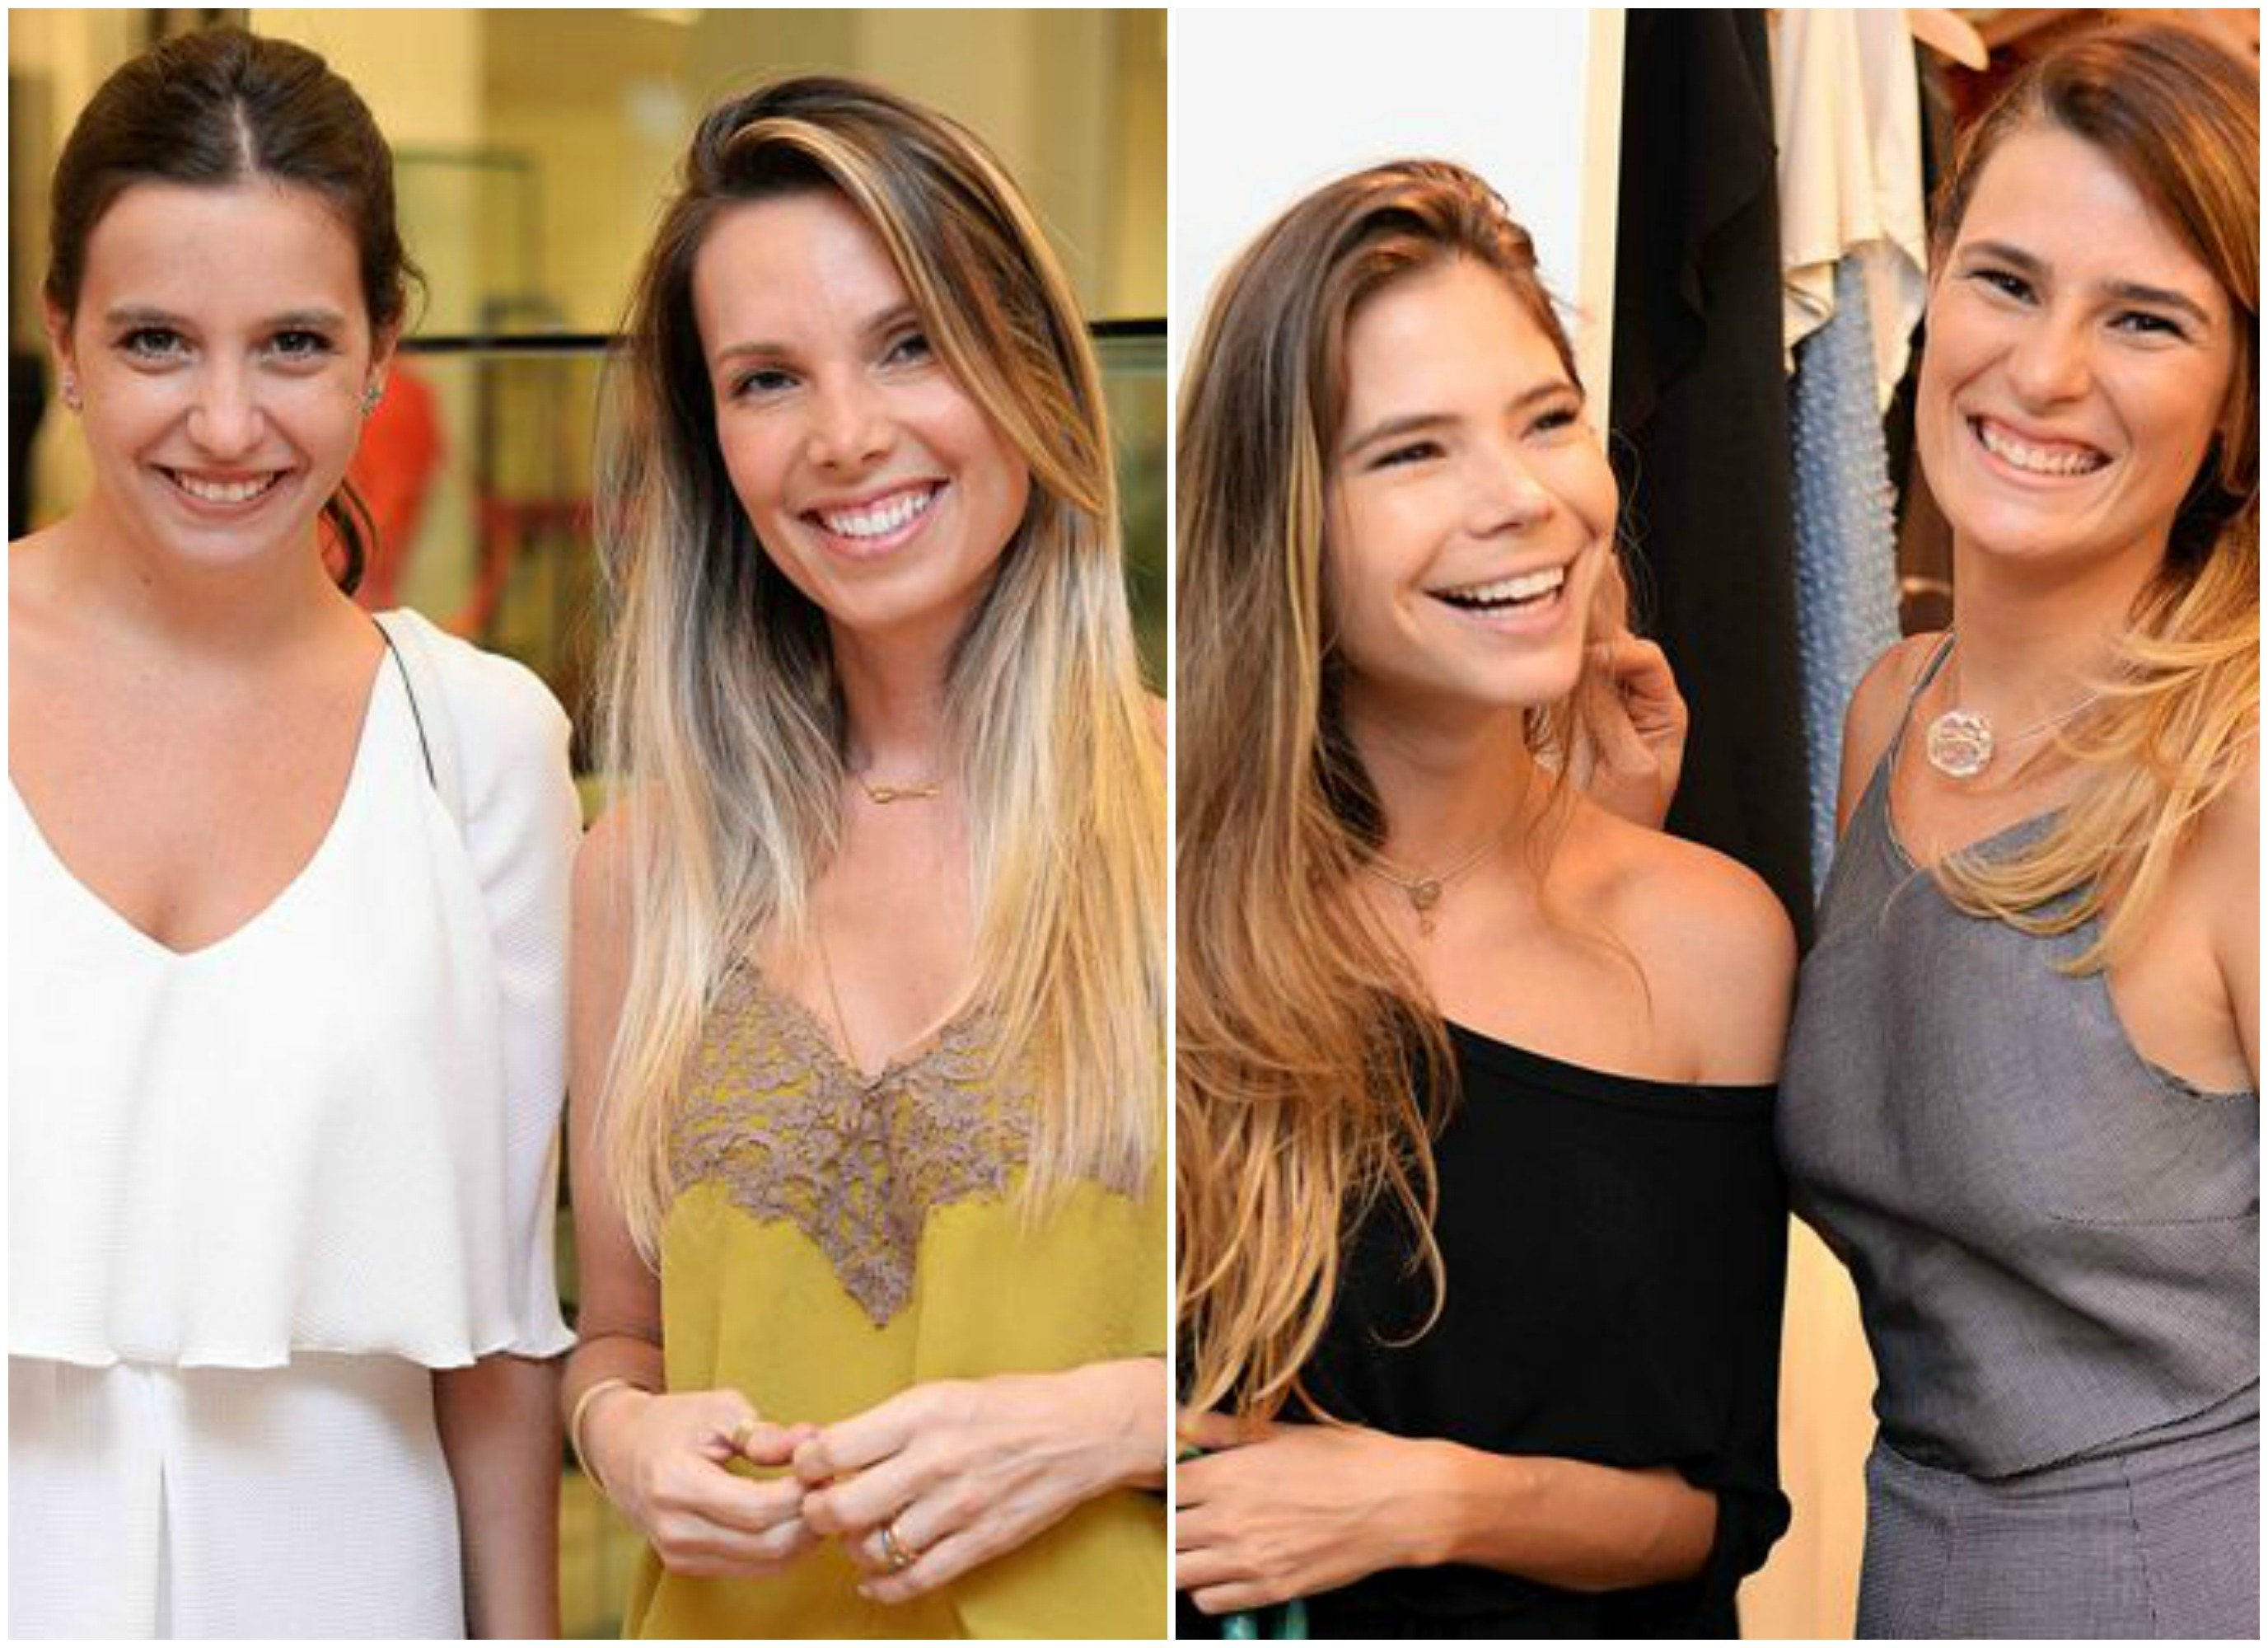 No alto, Zizi Ribeiro e Henriete Moreira; ao lado, Bianca Adler e Ana Luiza Tiago; acima, Rafaela Prado e Renata Morett; à direita, Glenda Ritterling e Renata Lamarca / Fotos: Ari Kaye